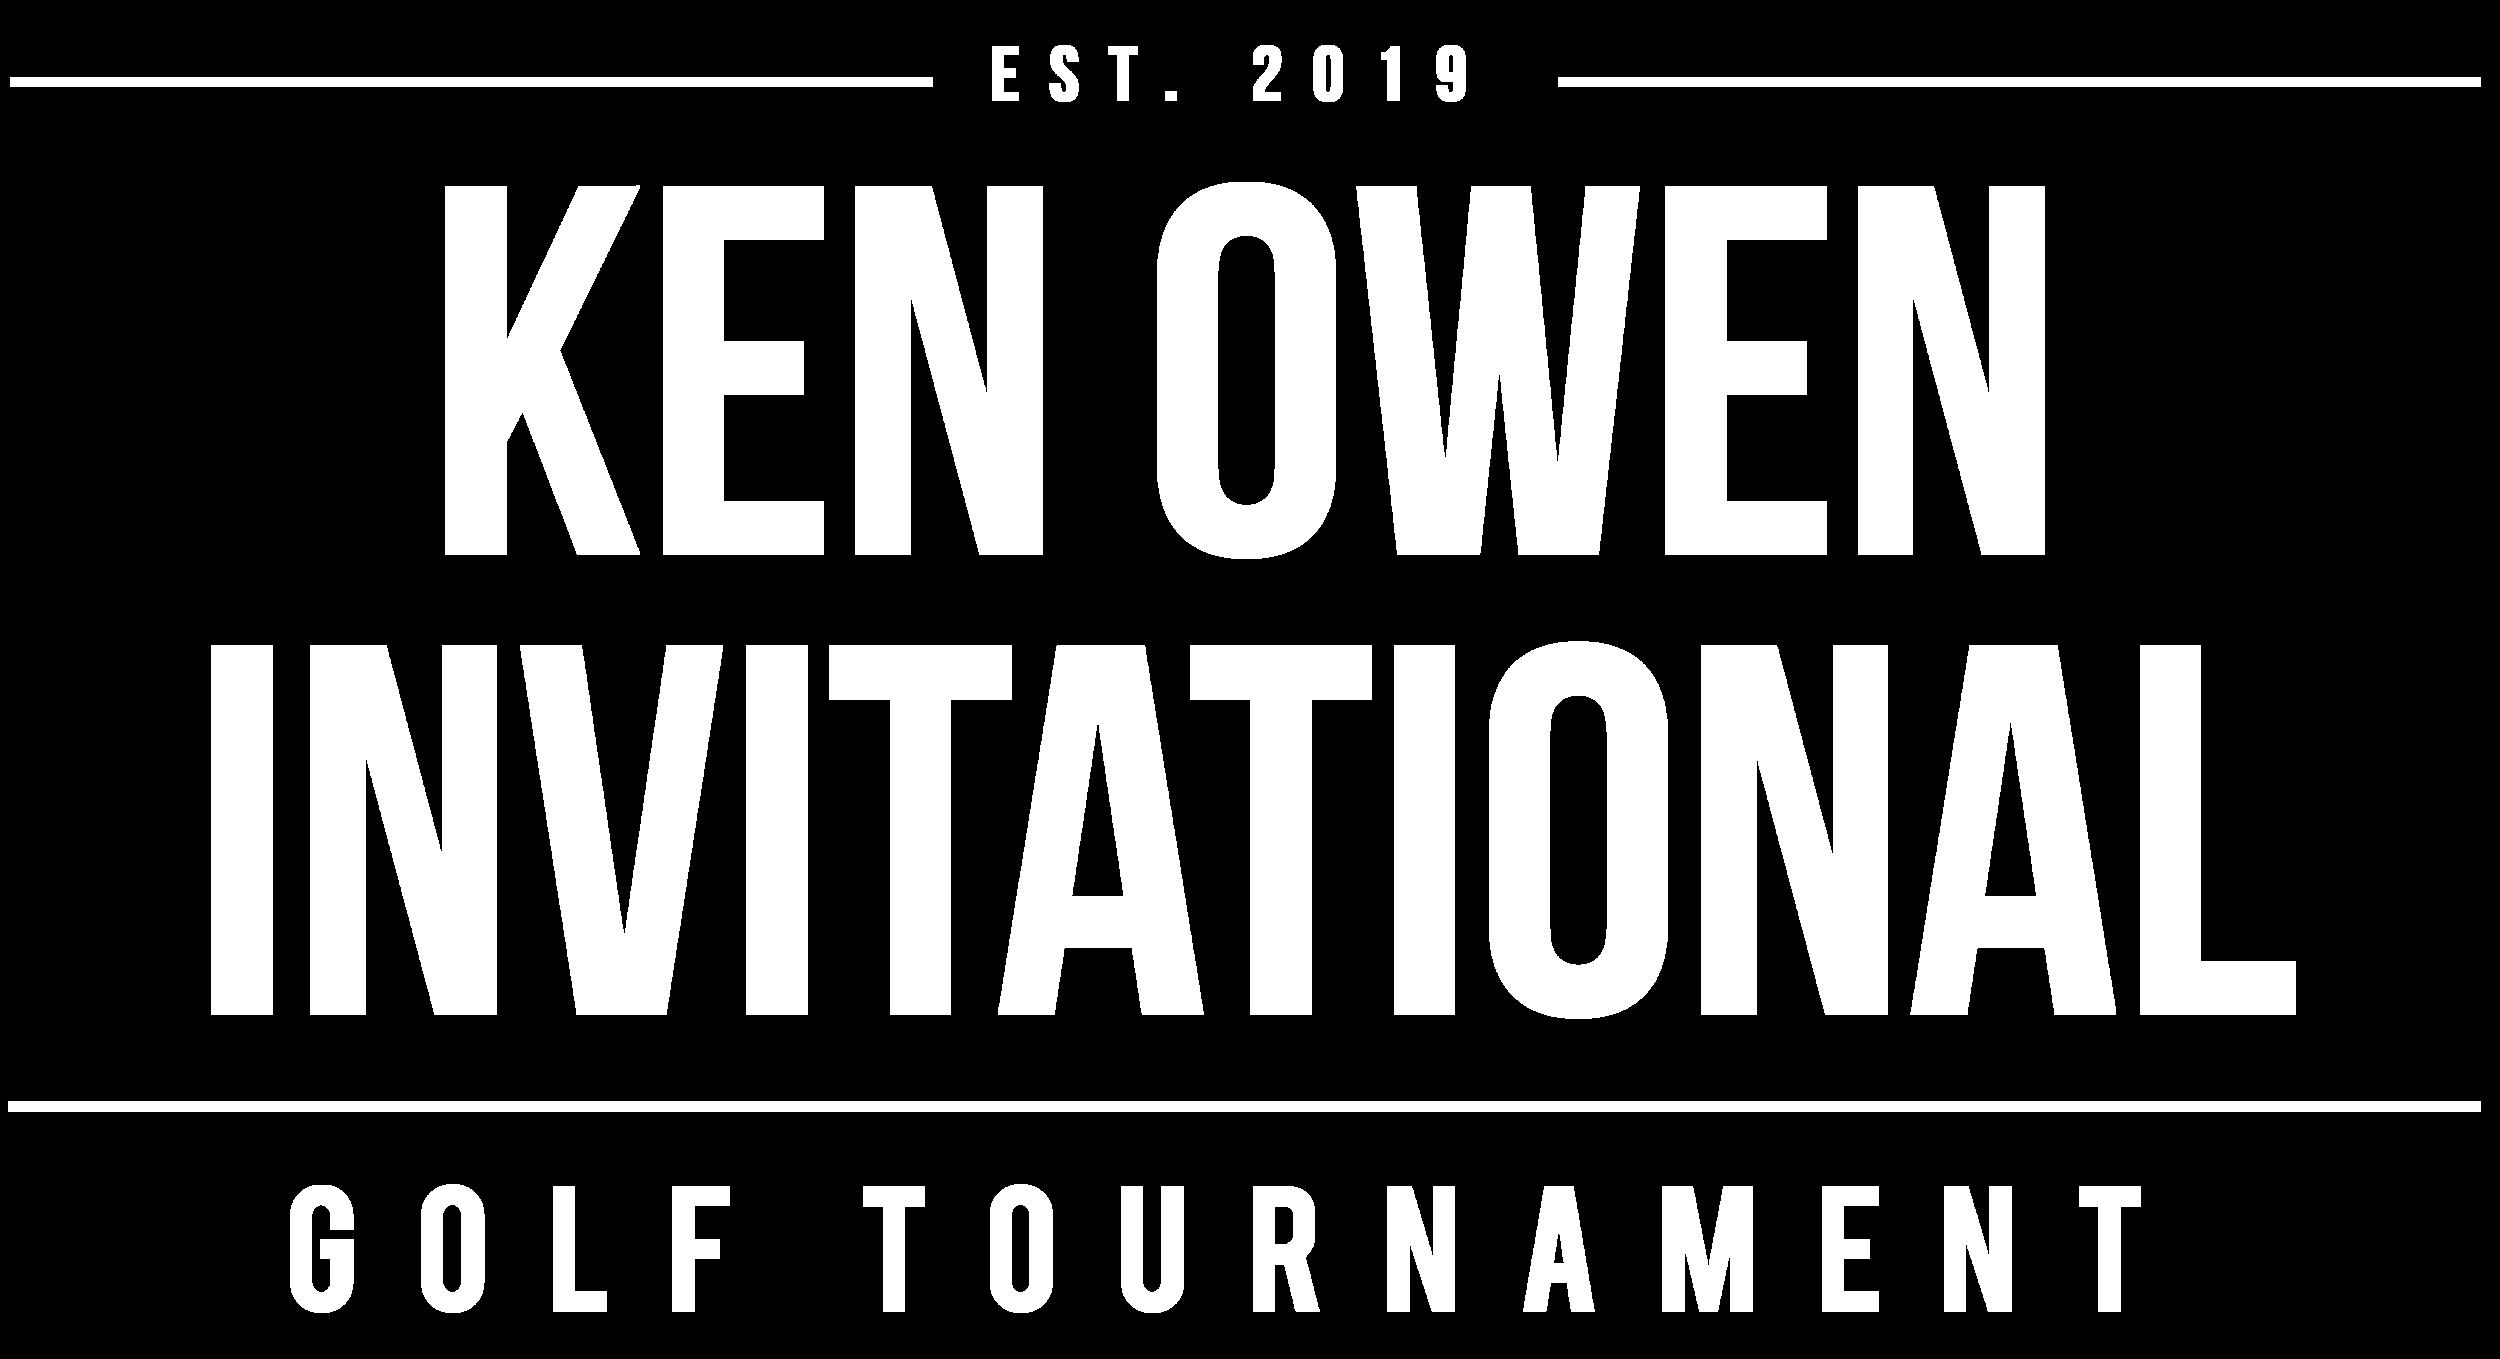 Invitational Logo (square - no mission).png